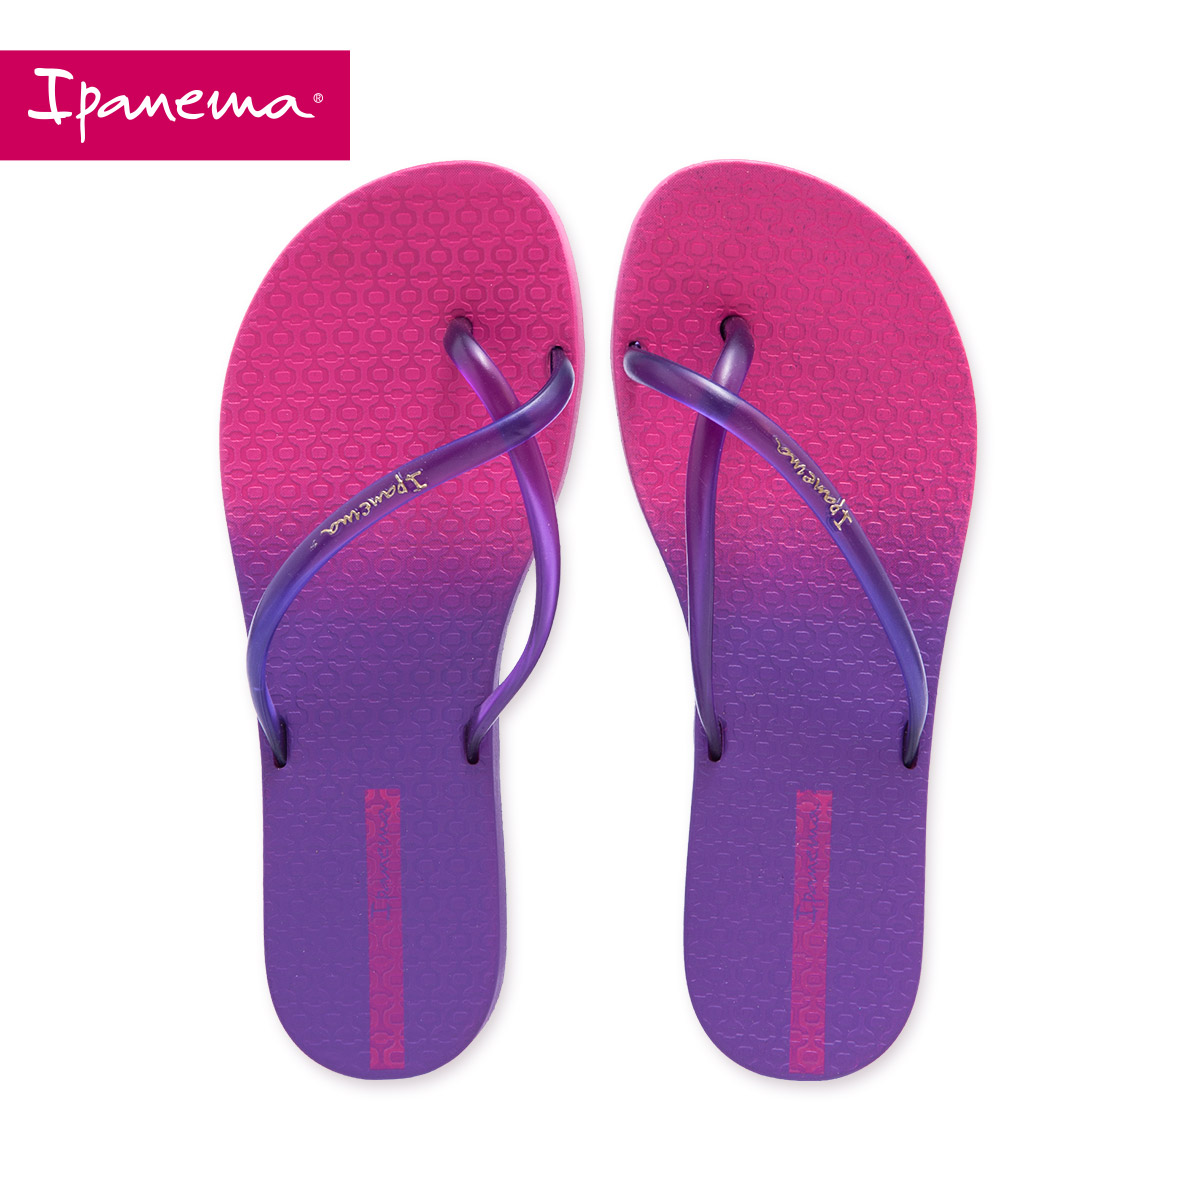 6b331e760def Ipanema flip-flops female beach summer custom sandals Brazil imported flip-flops  sandals